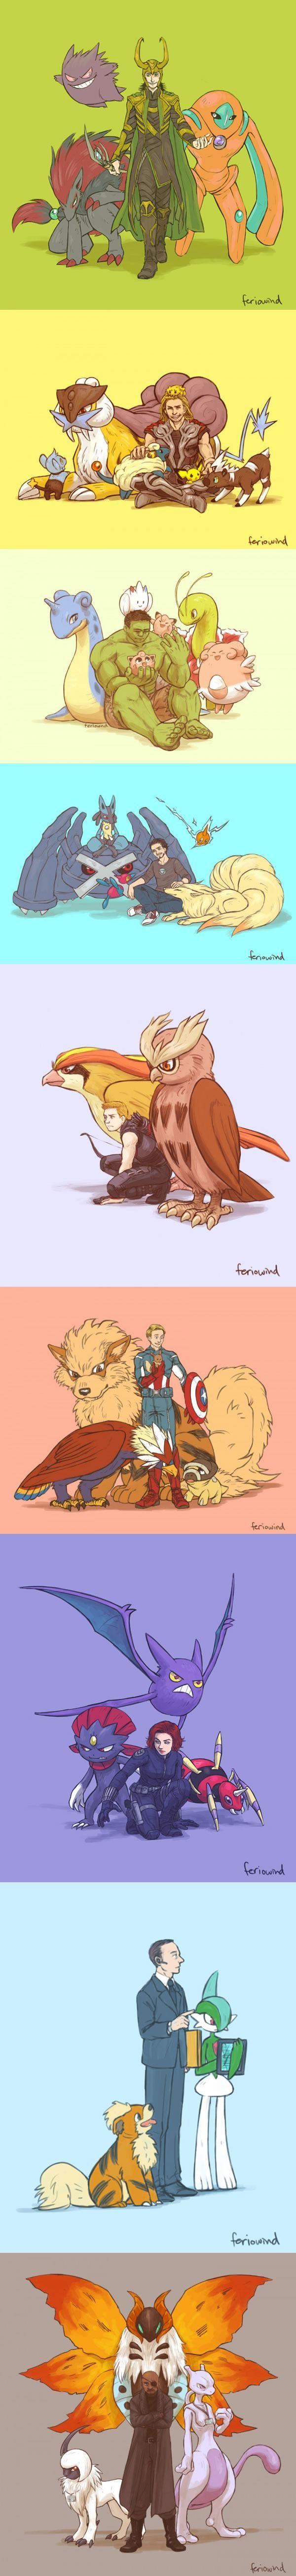 If the Avengers had Pokemons